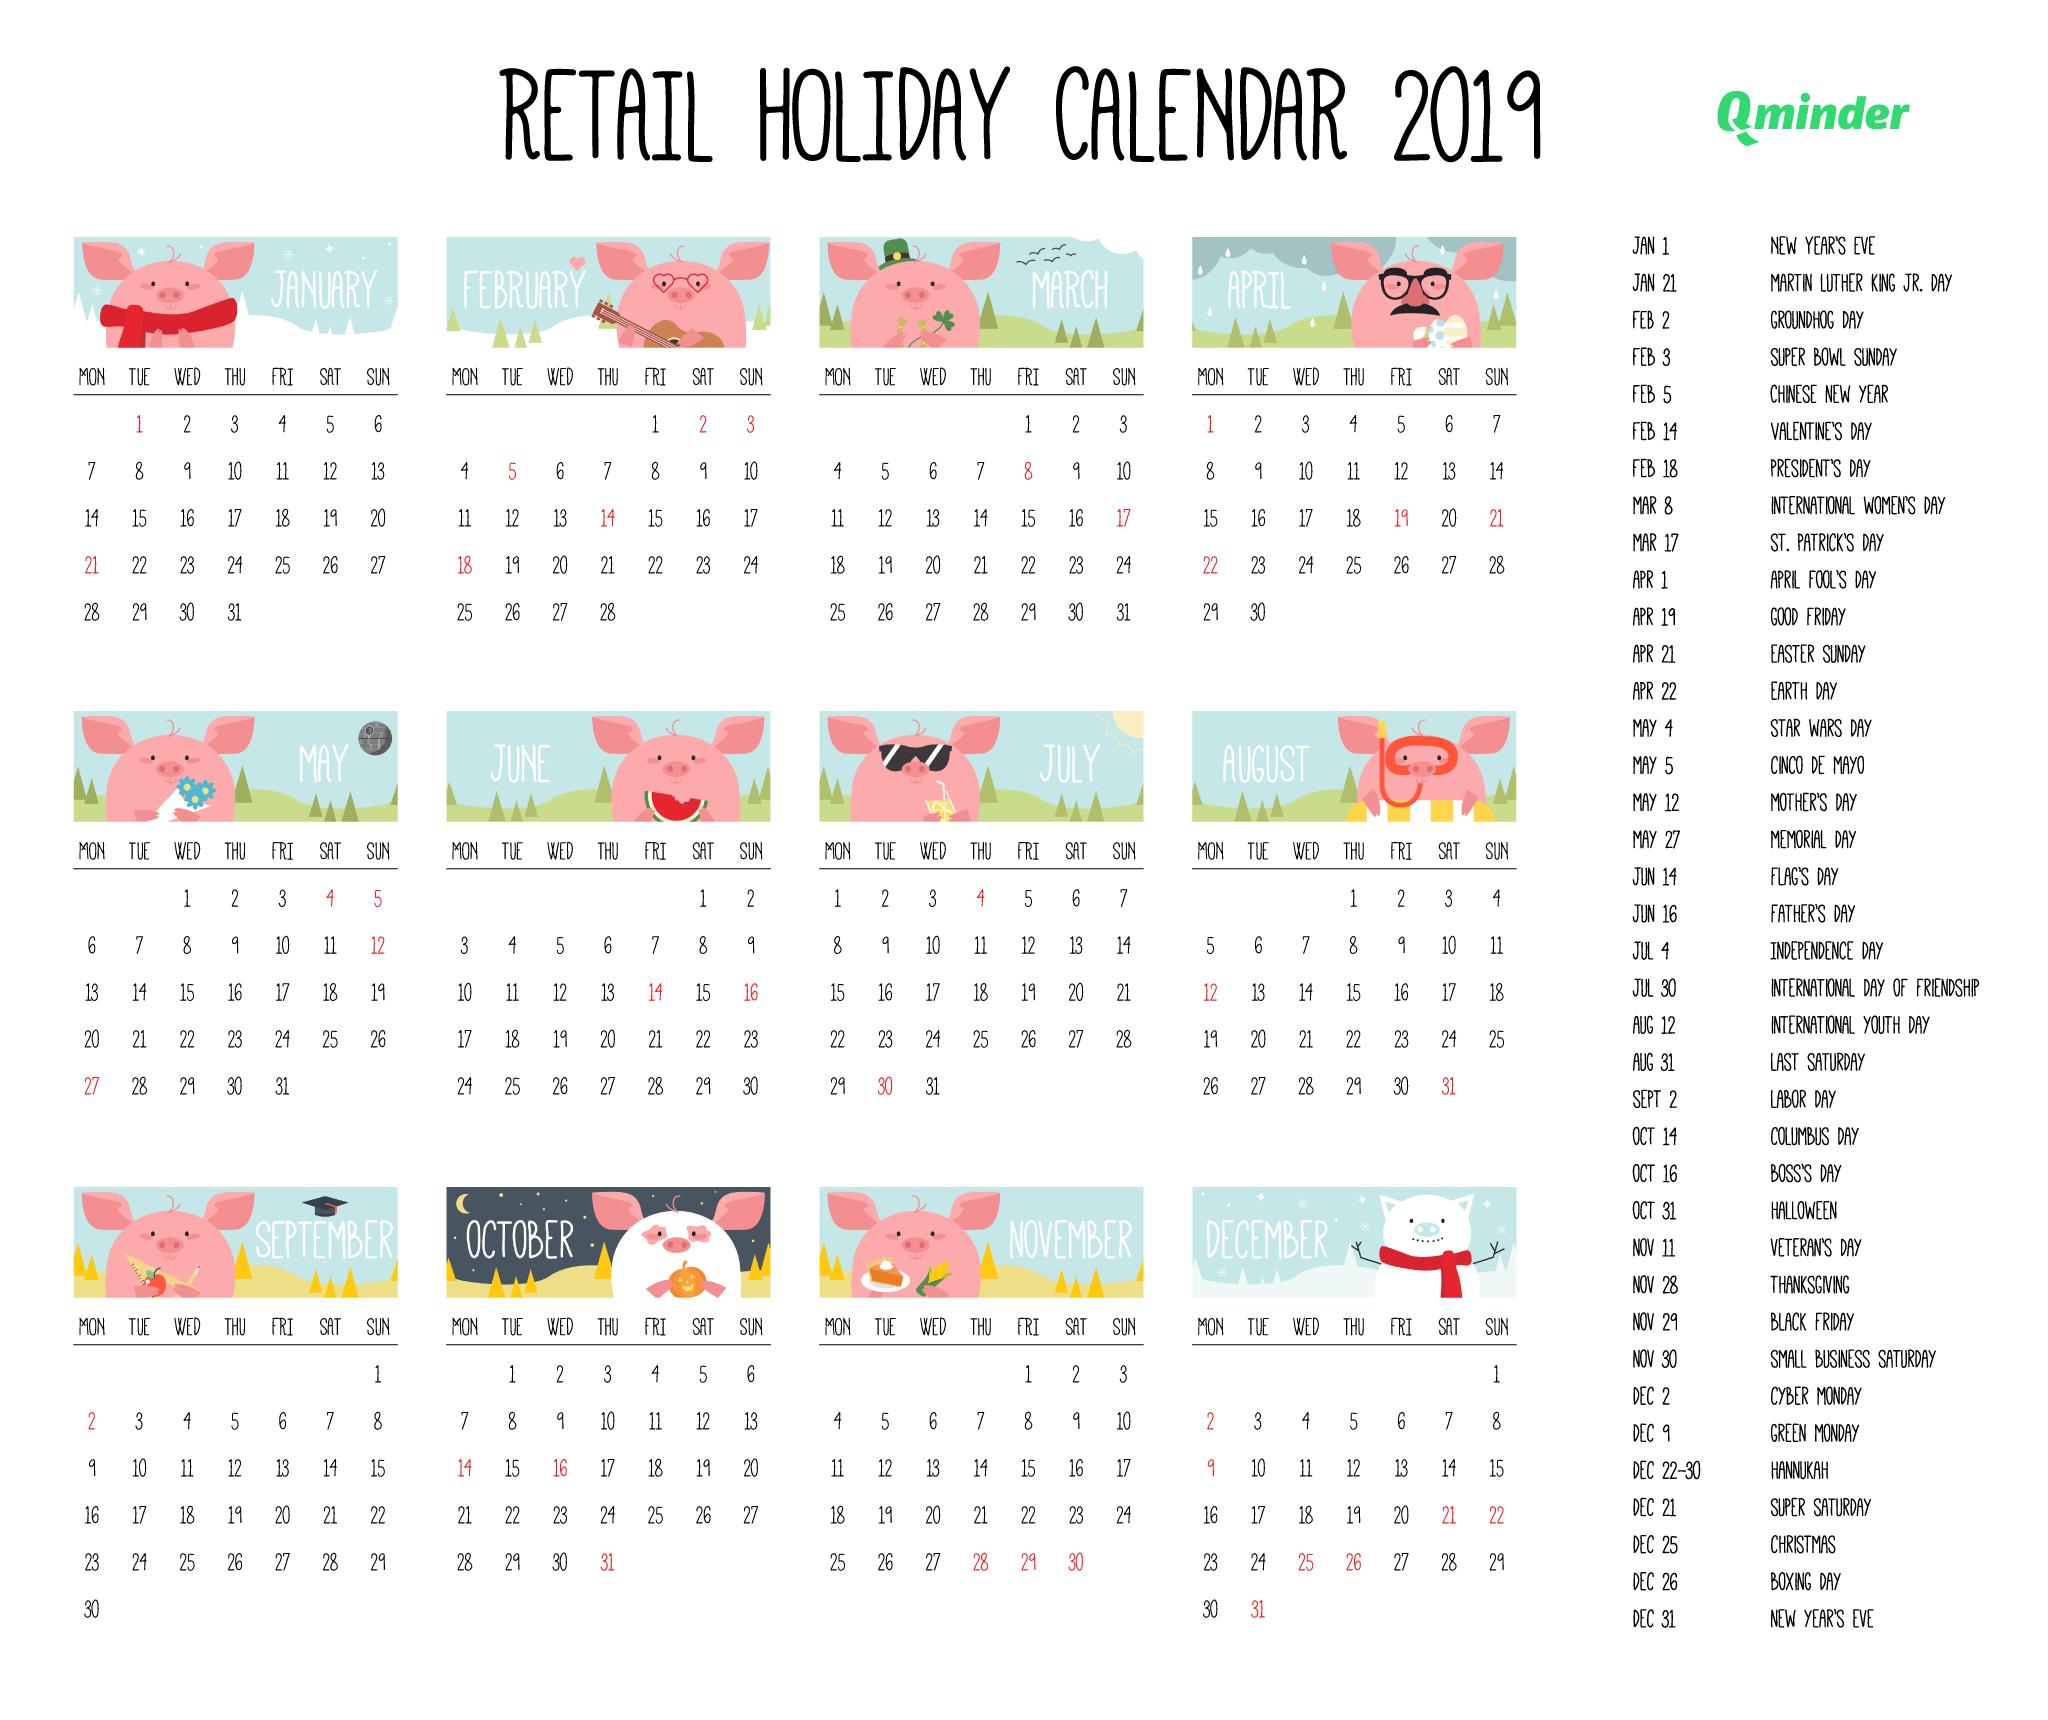 2020 Retail Calendar - Calendar Printable Free in Retsil 4 5 4 Cakander